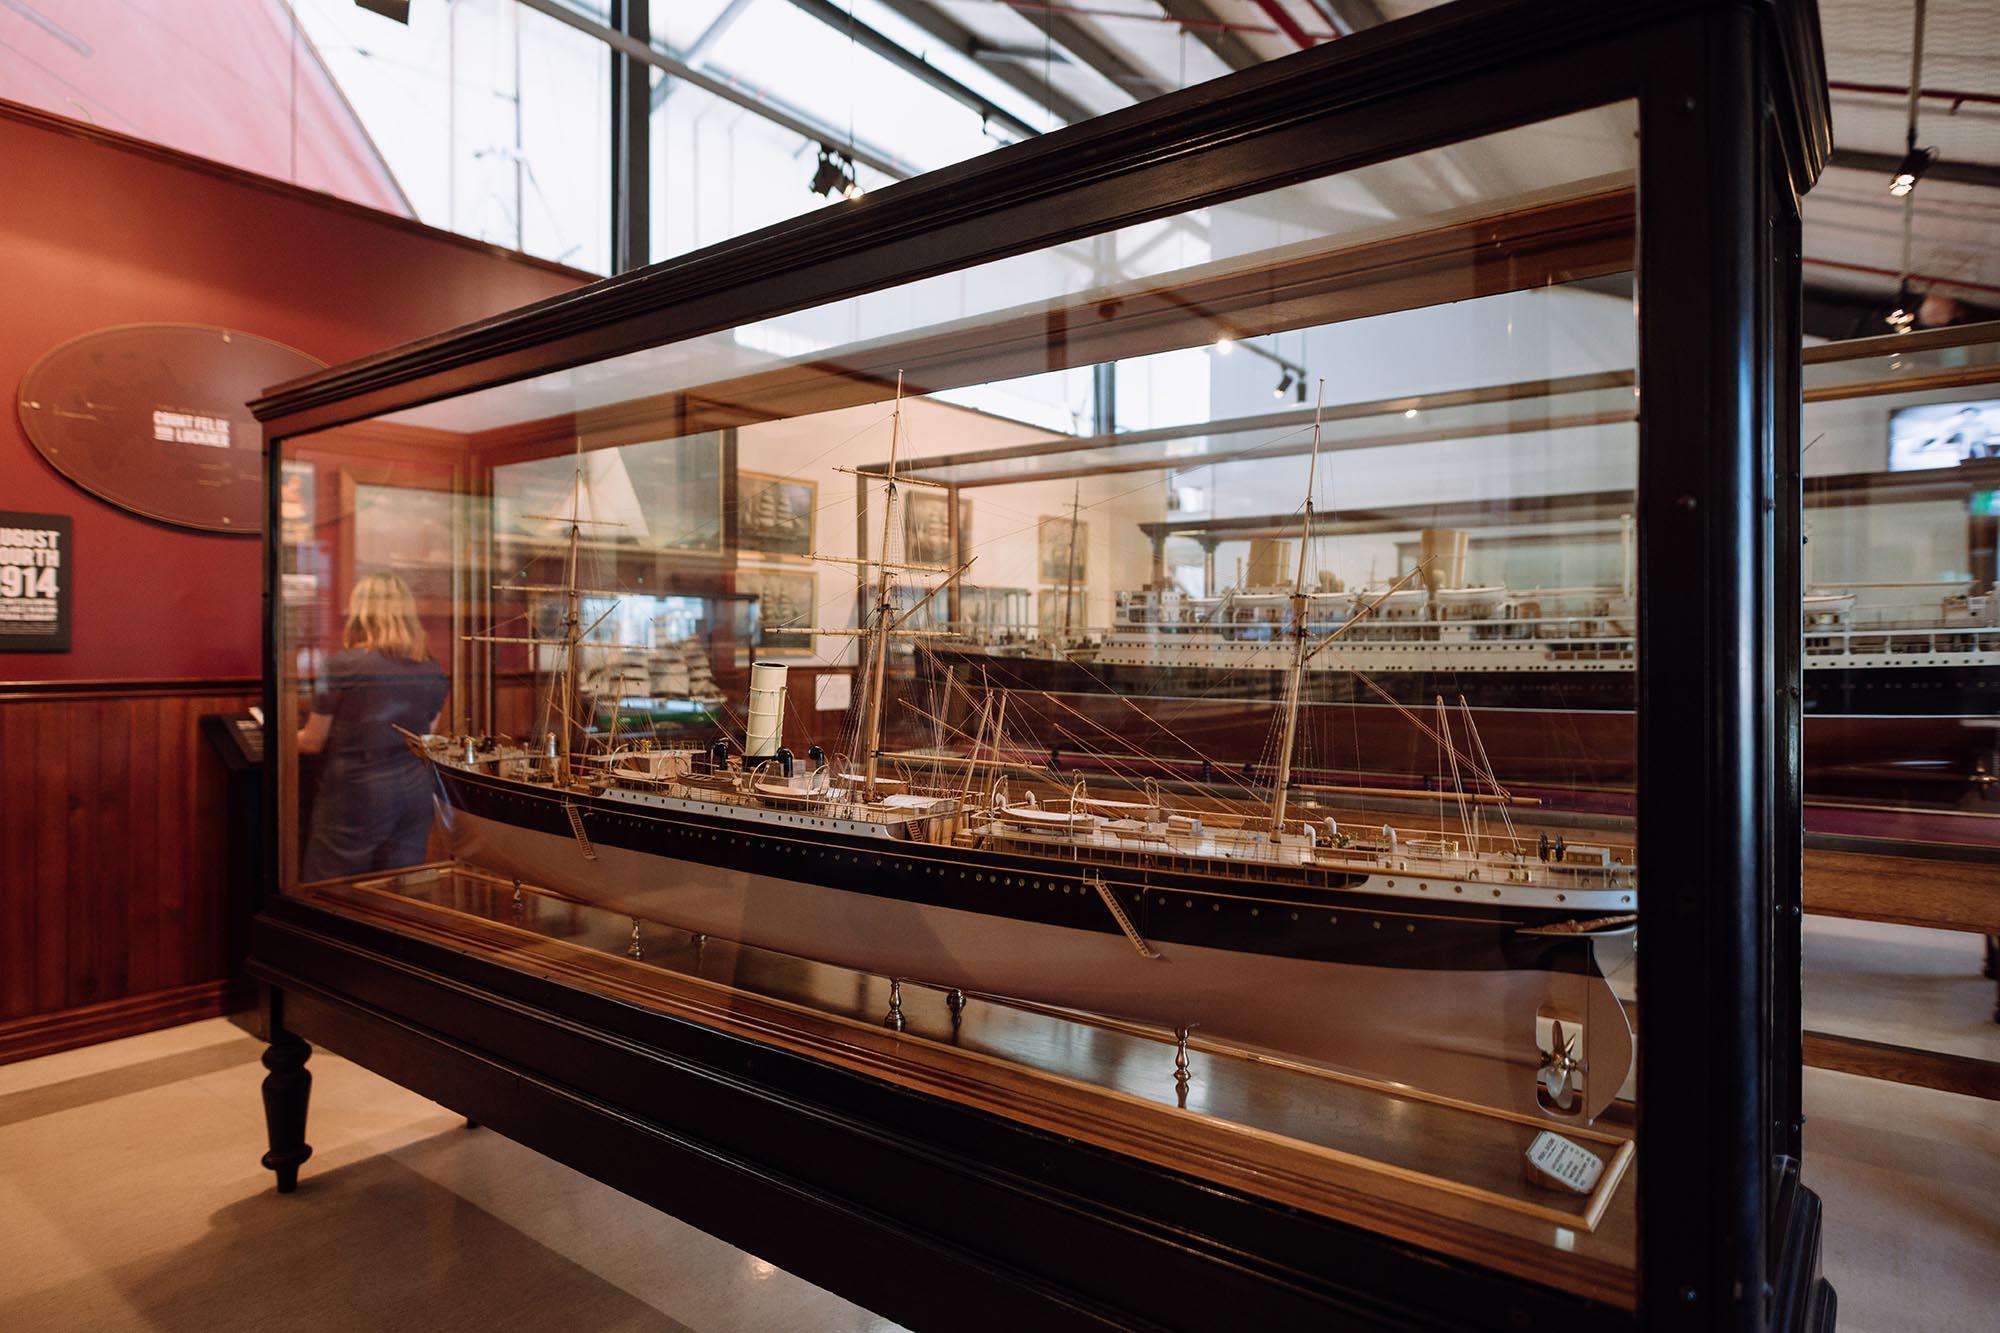 https://rfacdn.nz/maritime/assets/media/display-models-gallery-carousel.jpg